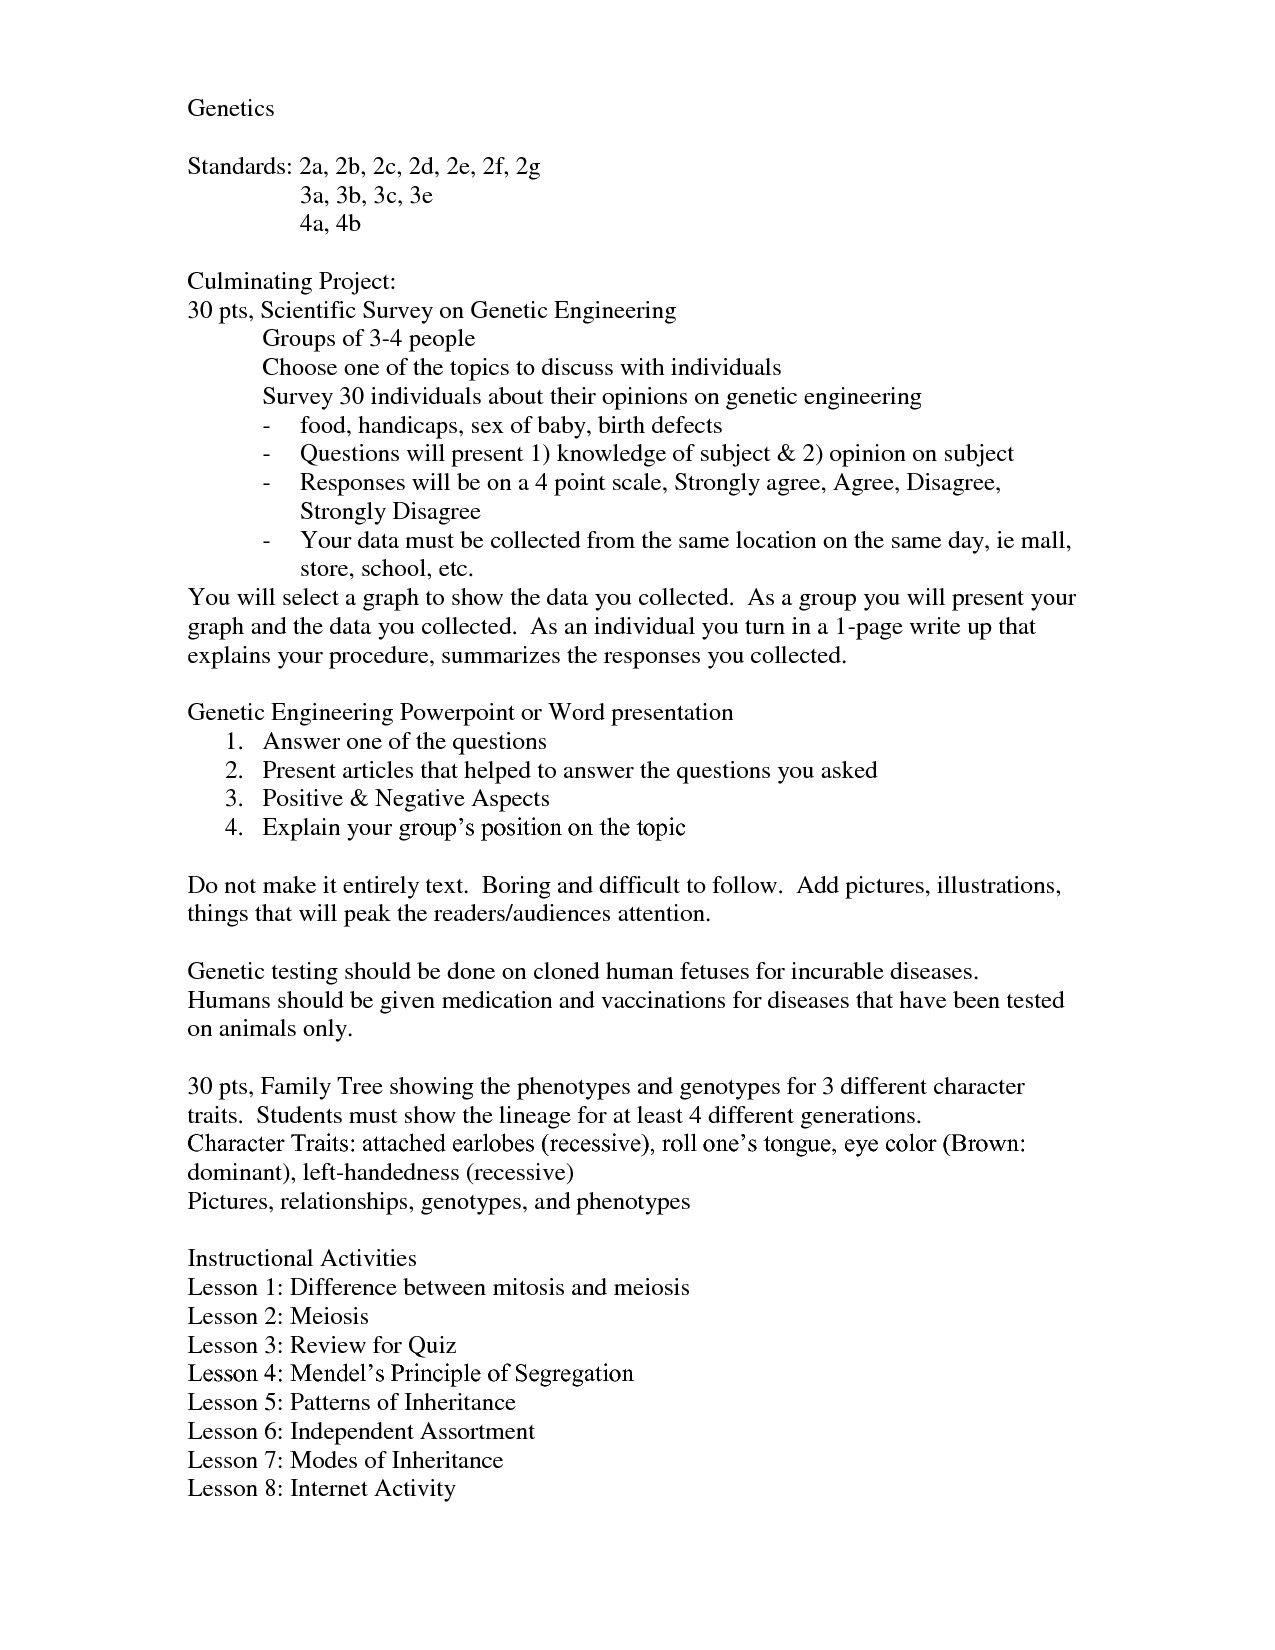 Genetics Problems Worksheet 1 Answer Key